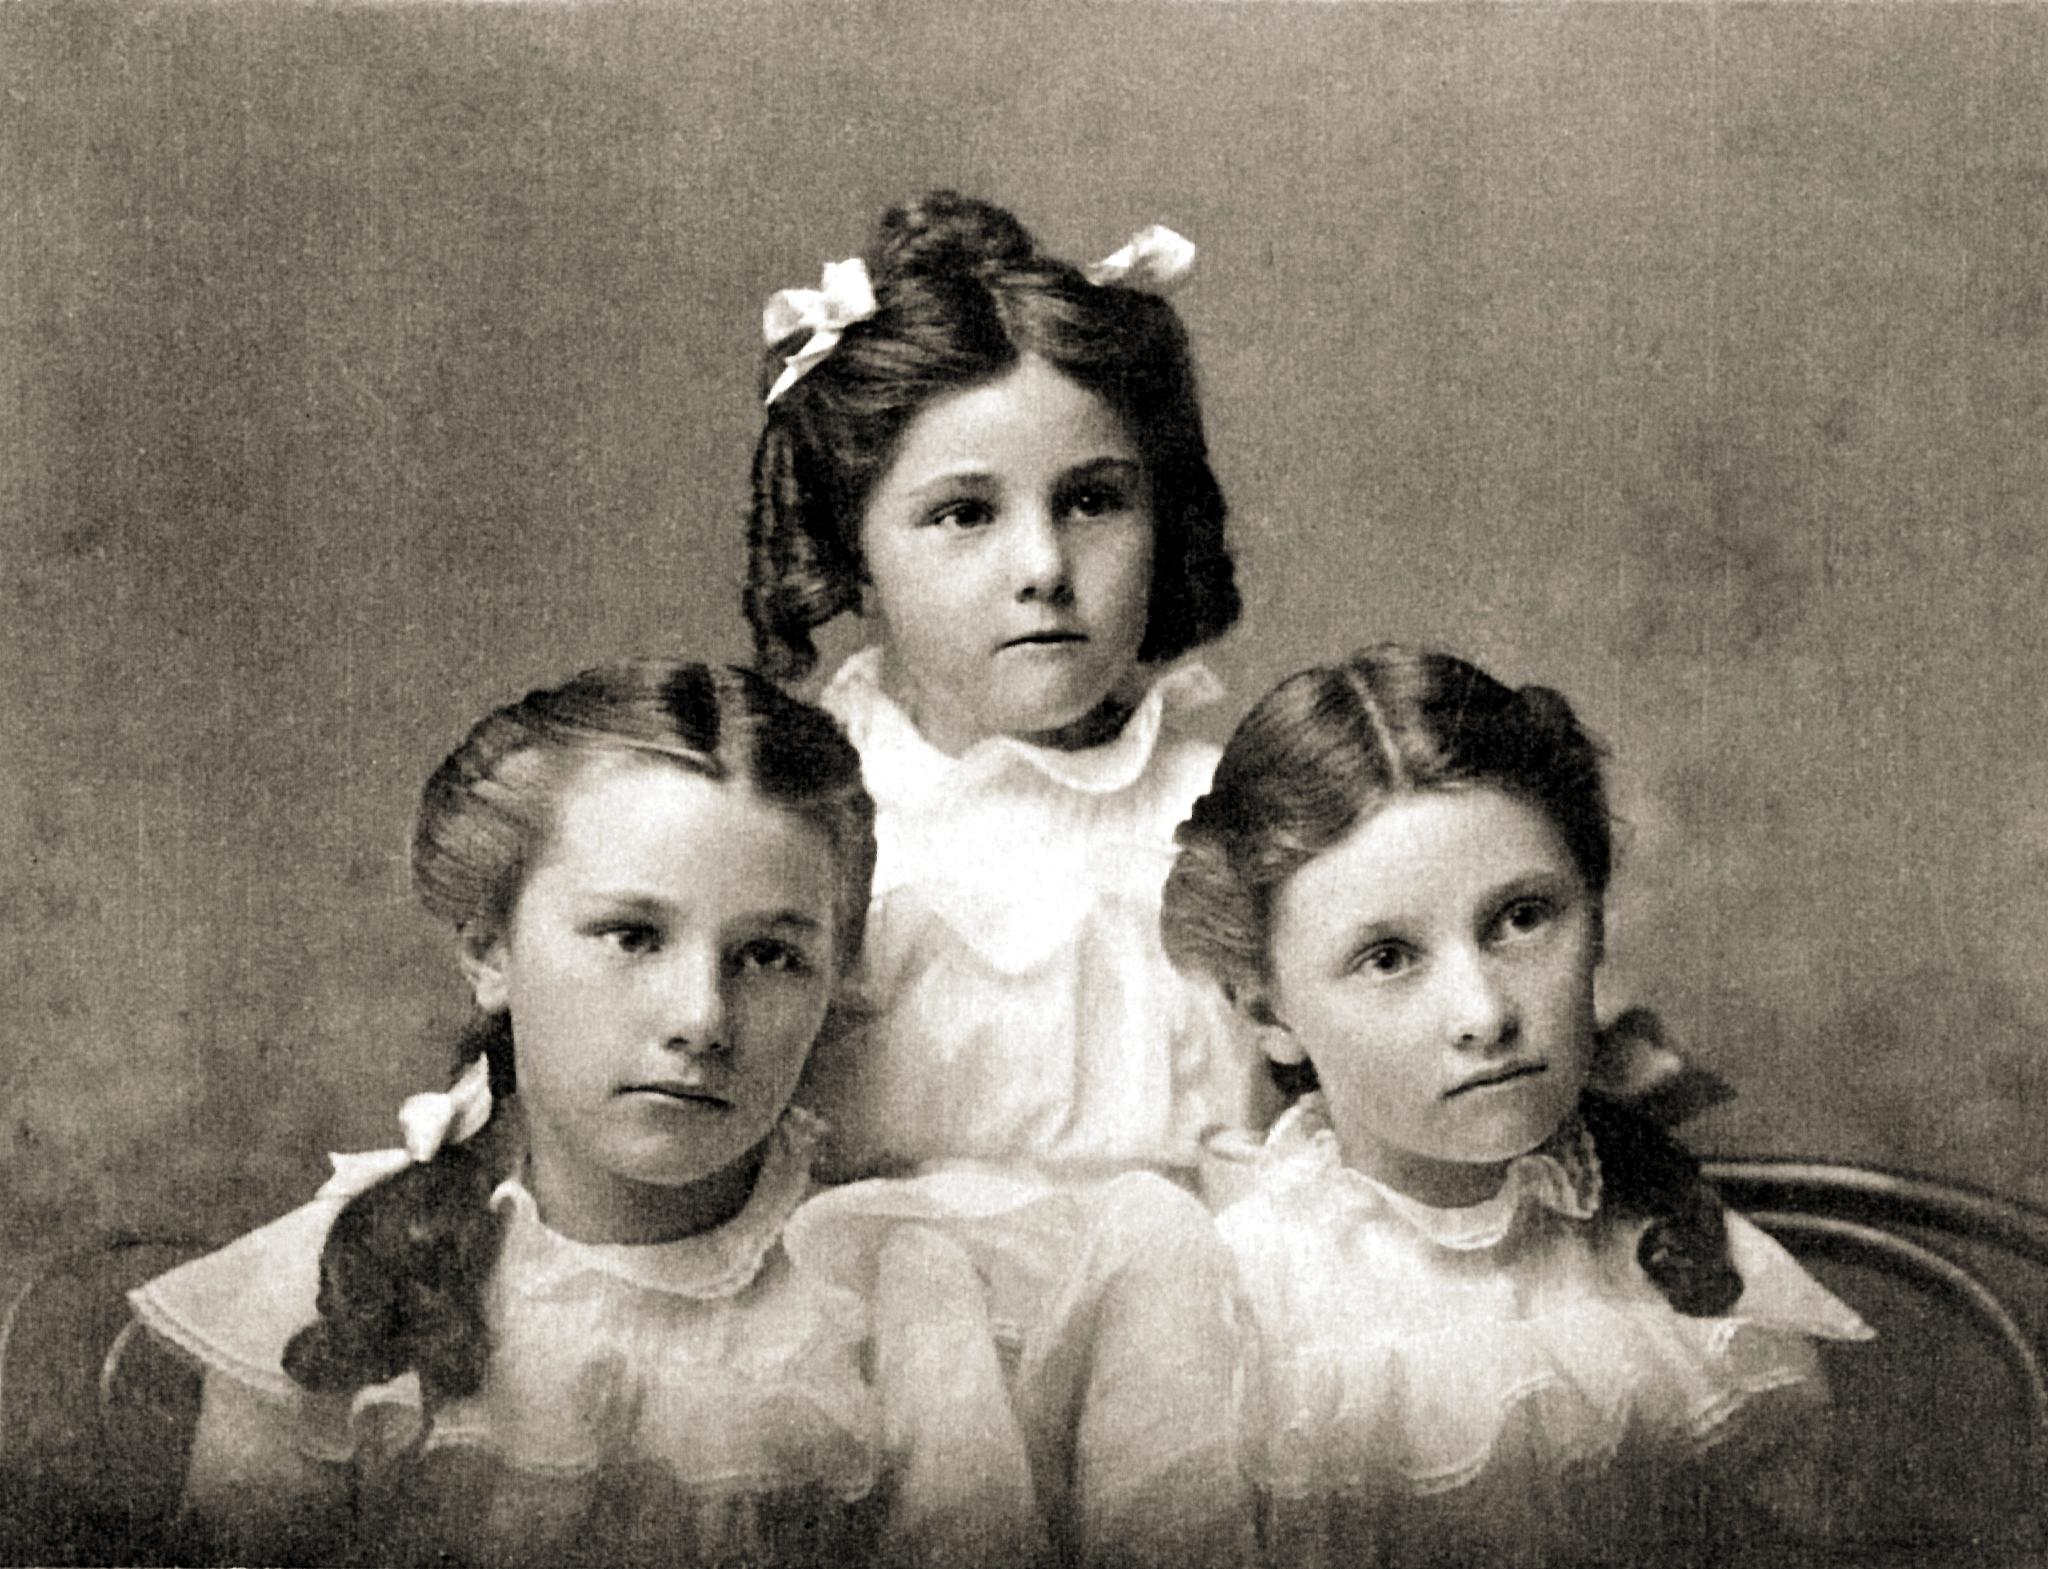 Elsie, May & Gladys Kloninger